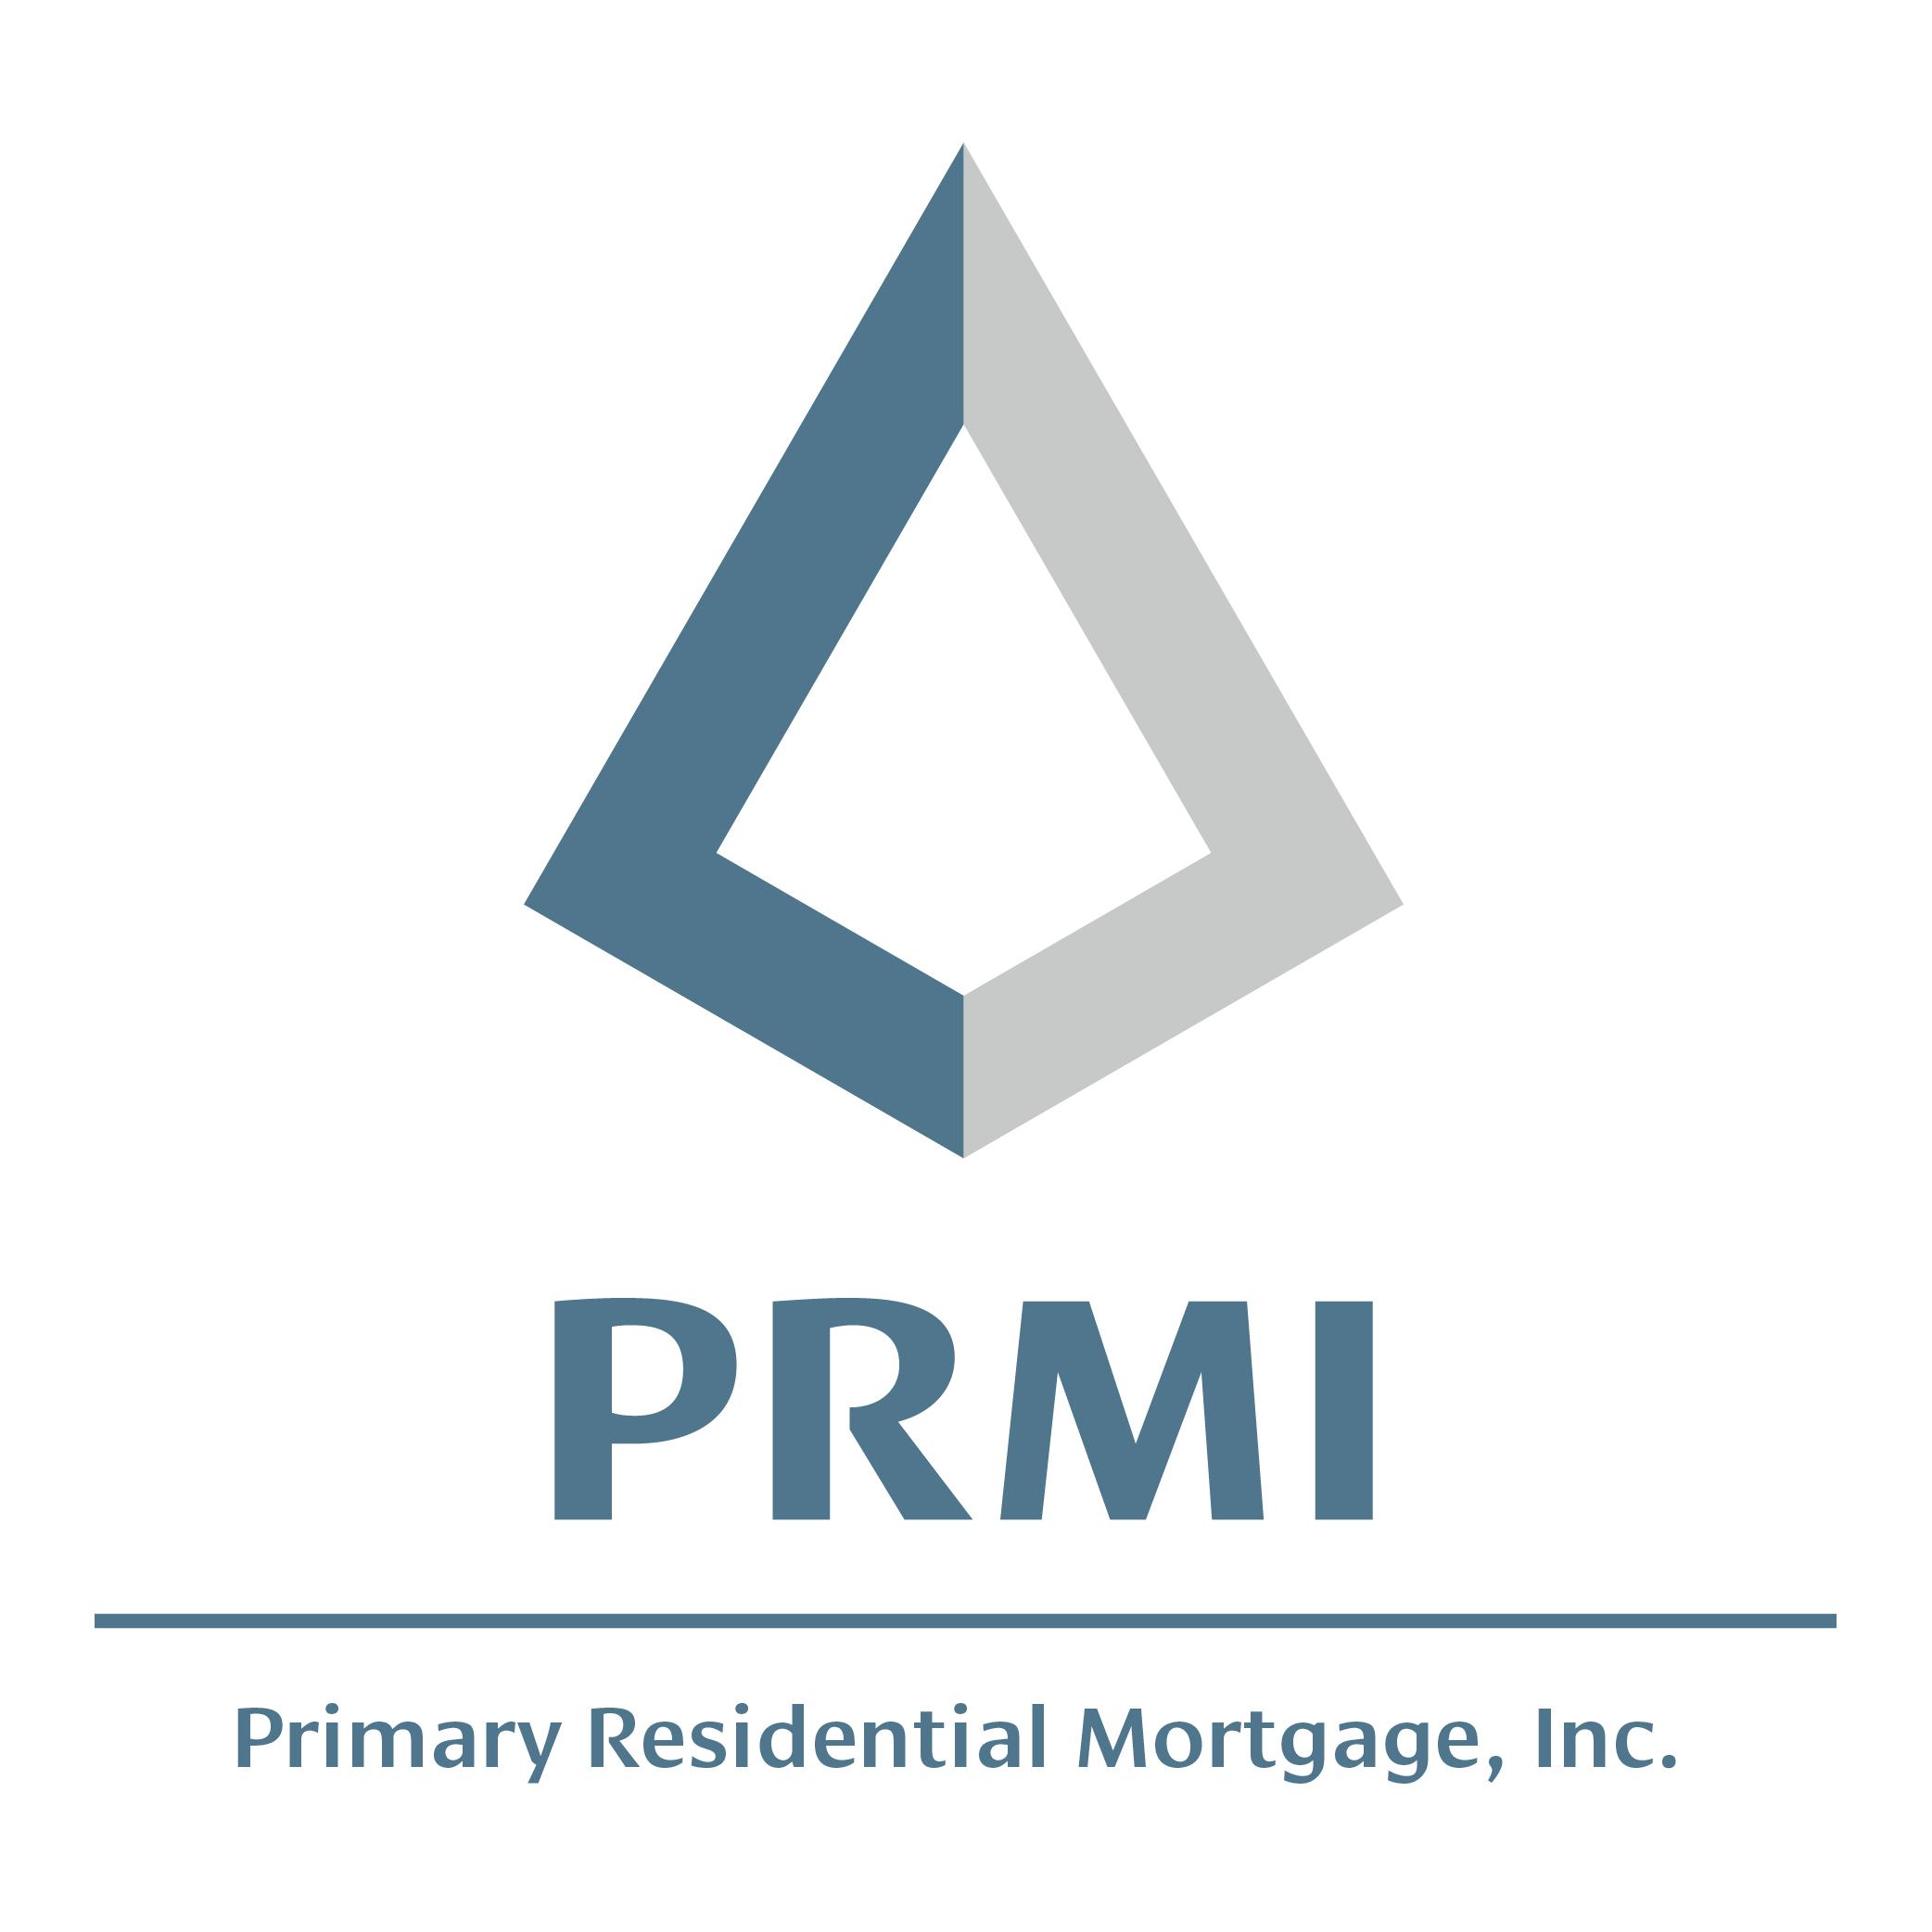 Primary Residential Mortgage, Inc. - Washington, DC 20002 - (202)601-3227 | ShowMeLocal.com